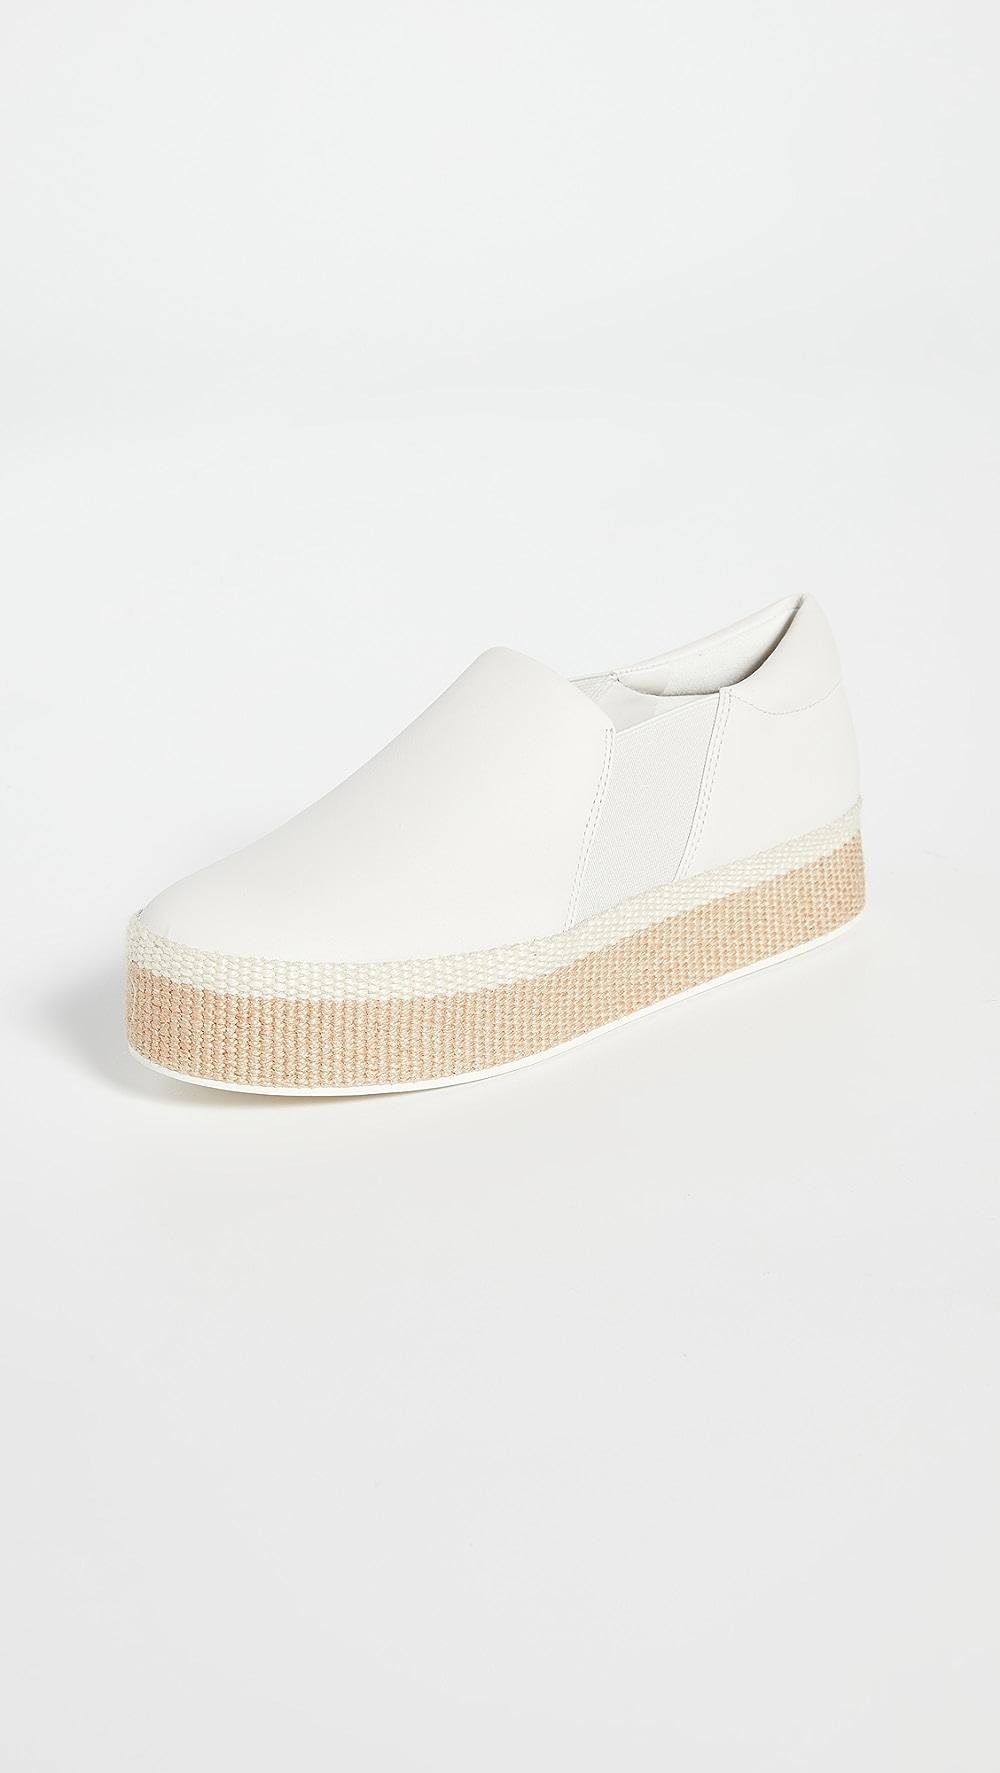 100% True Vince - Wilden Slip On Sneakers Easy To Lubricate